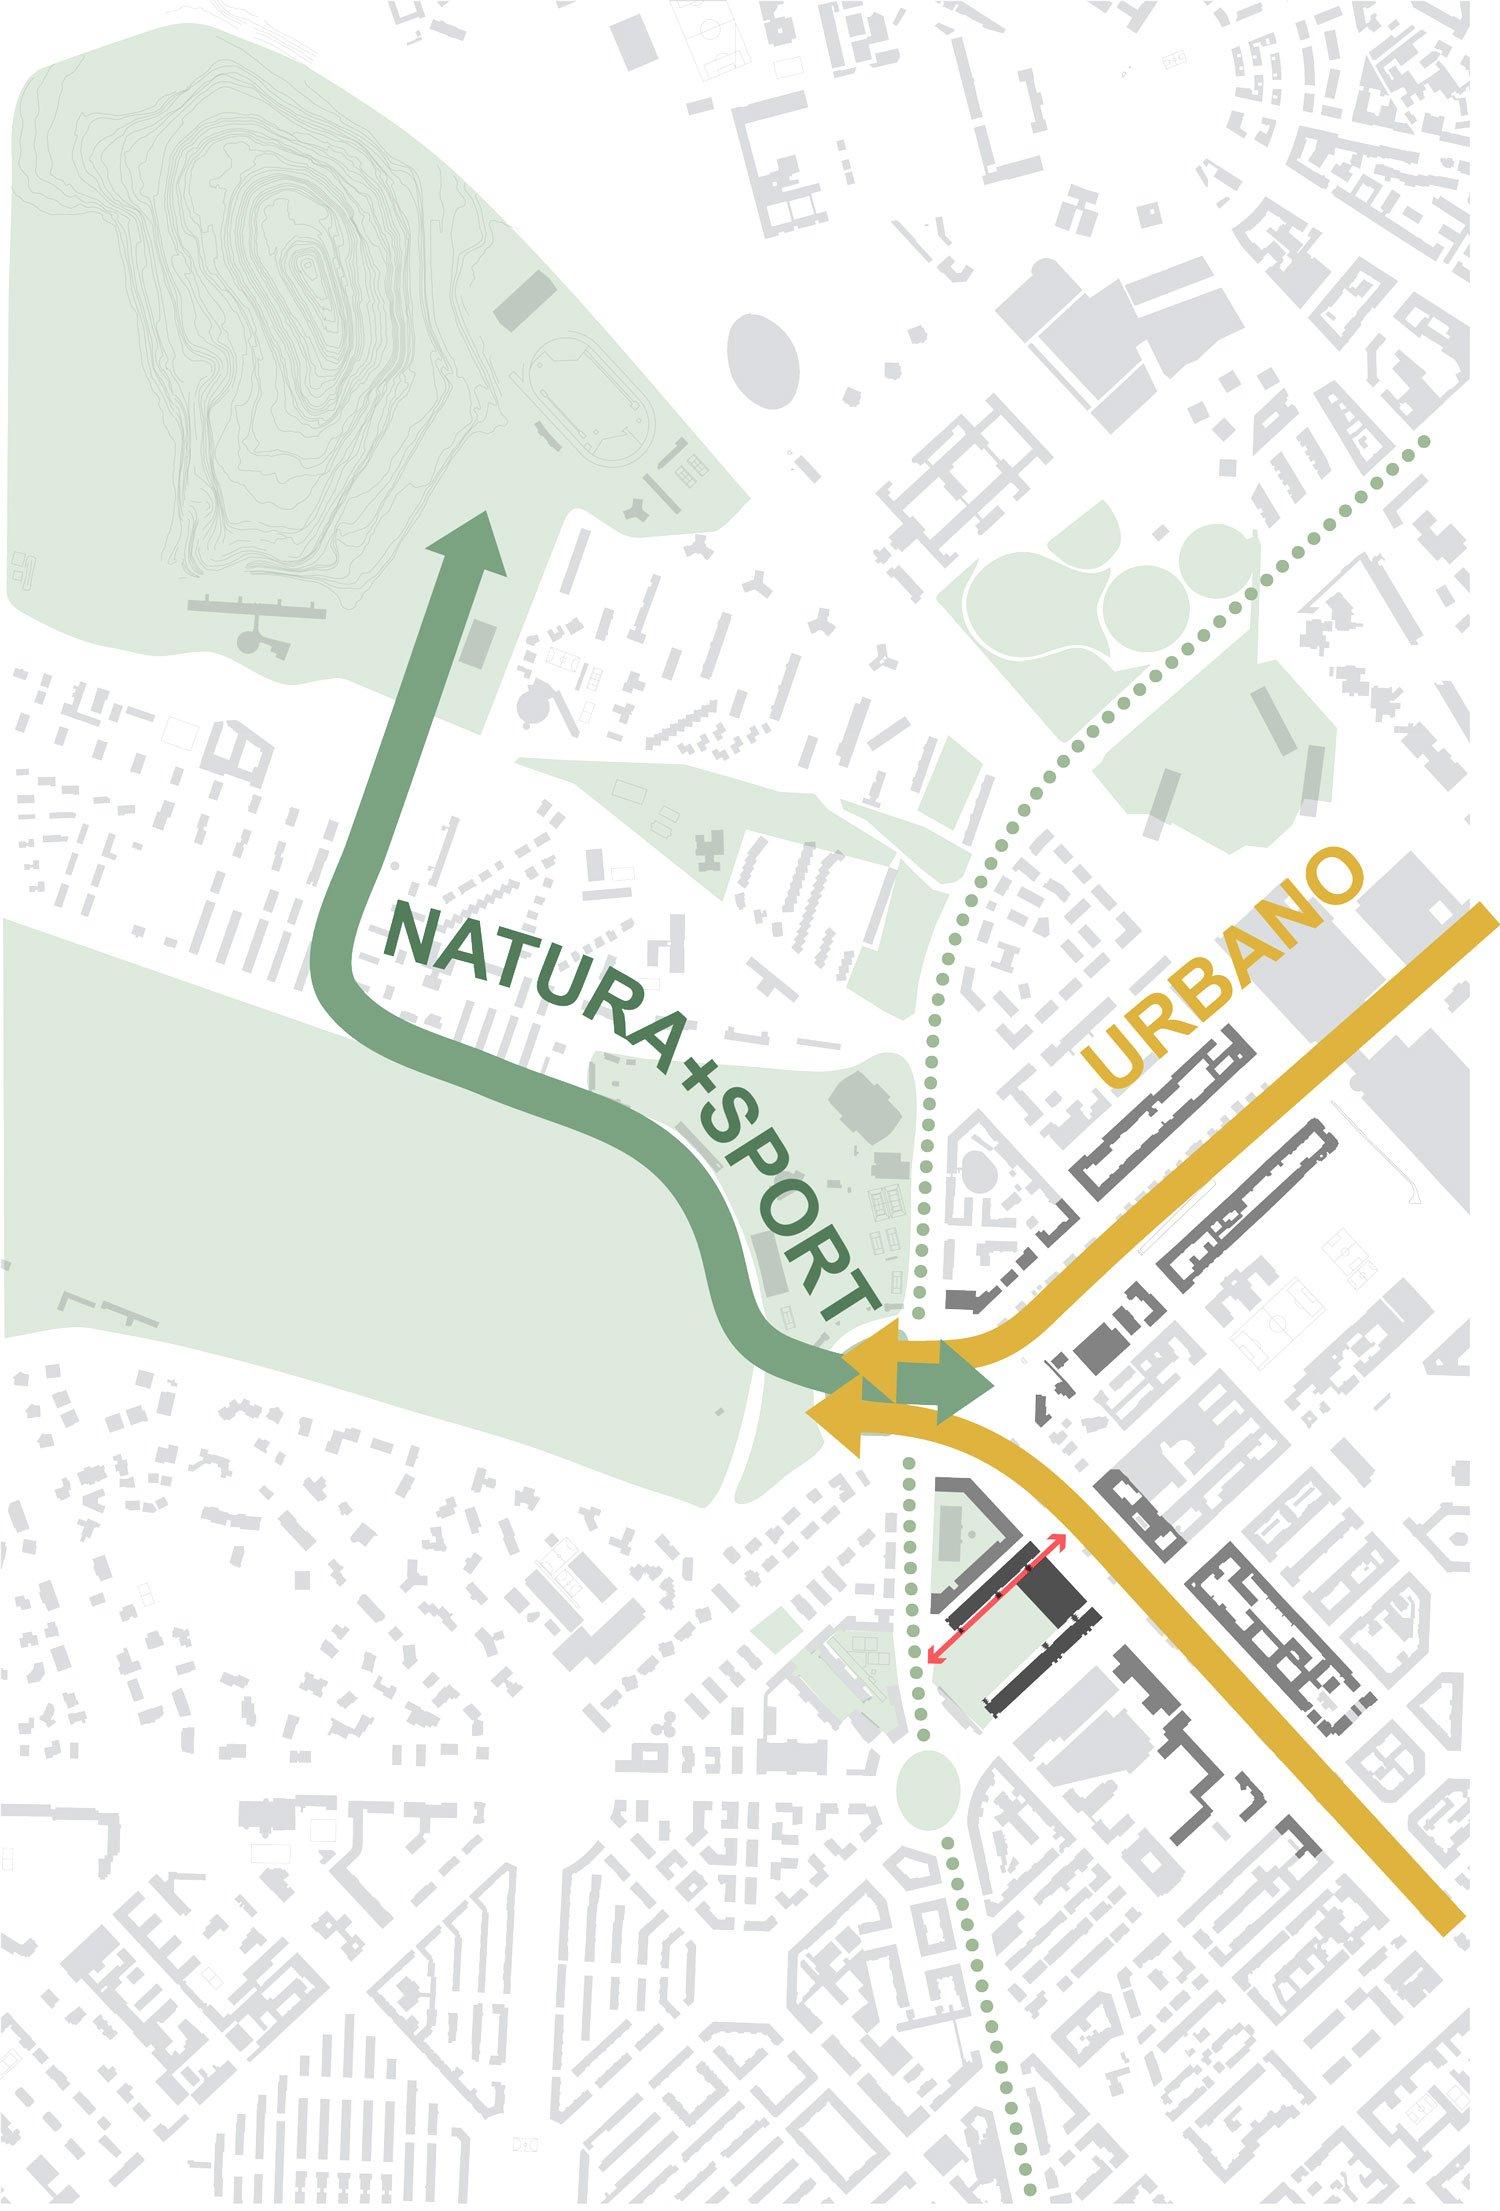 Urban-Training-Nature+urban-planning Il Prisma